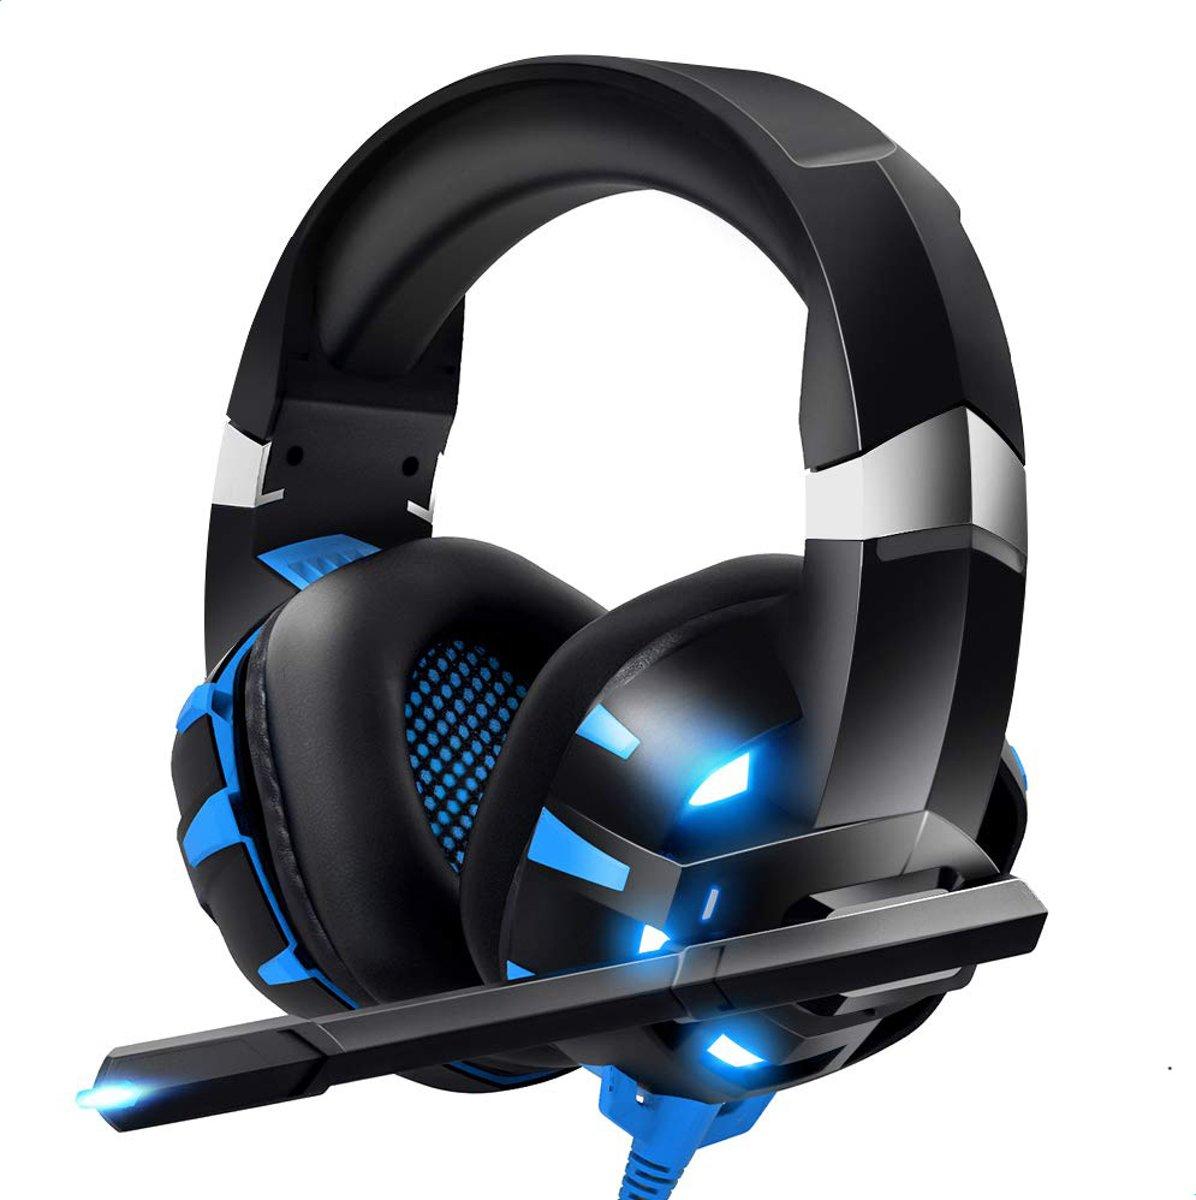 Gaming Headset Blauw | Koptelefoon |7.1 Surround Sound | Microfoon | Noise Canceling | PC, PS4, Xbox One kopen